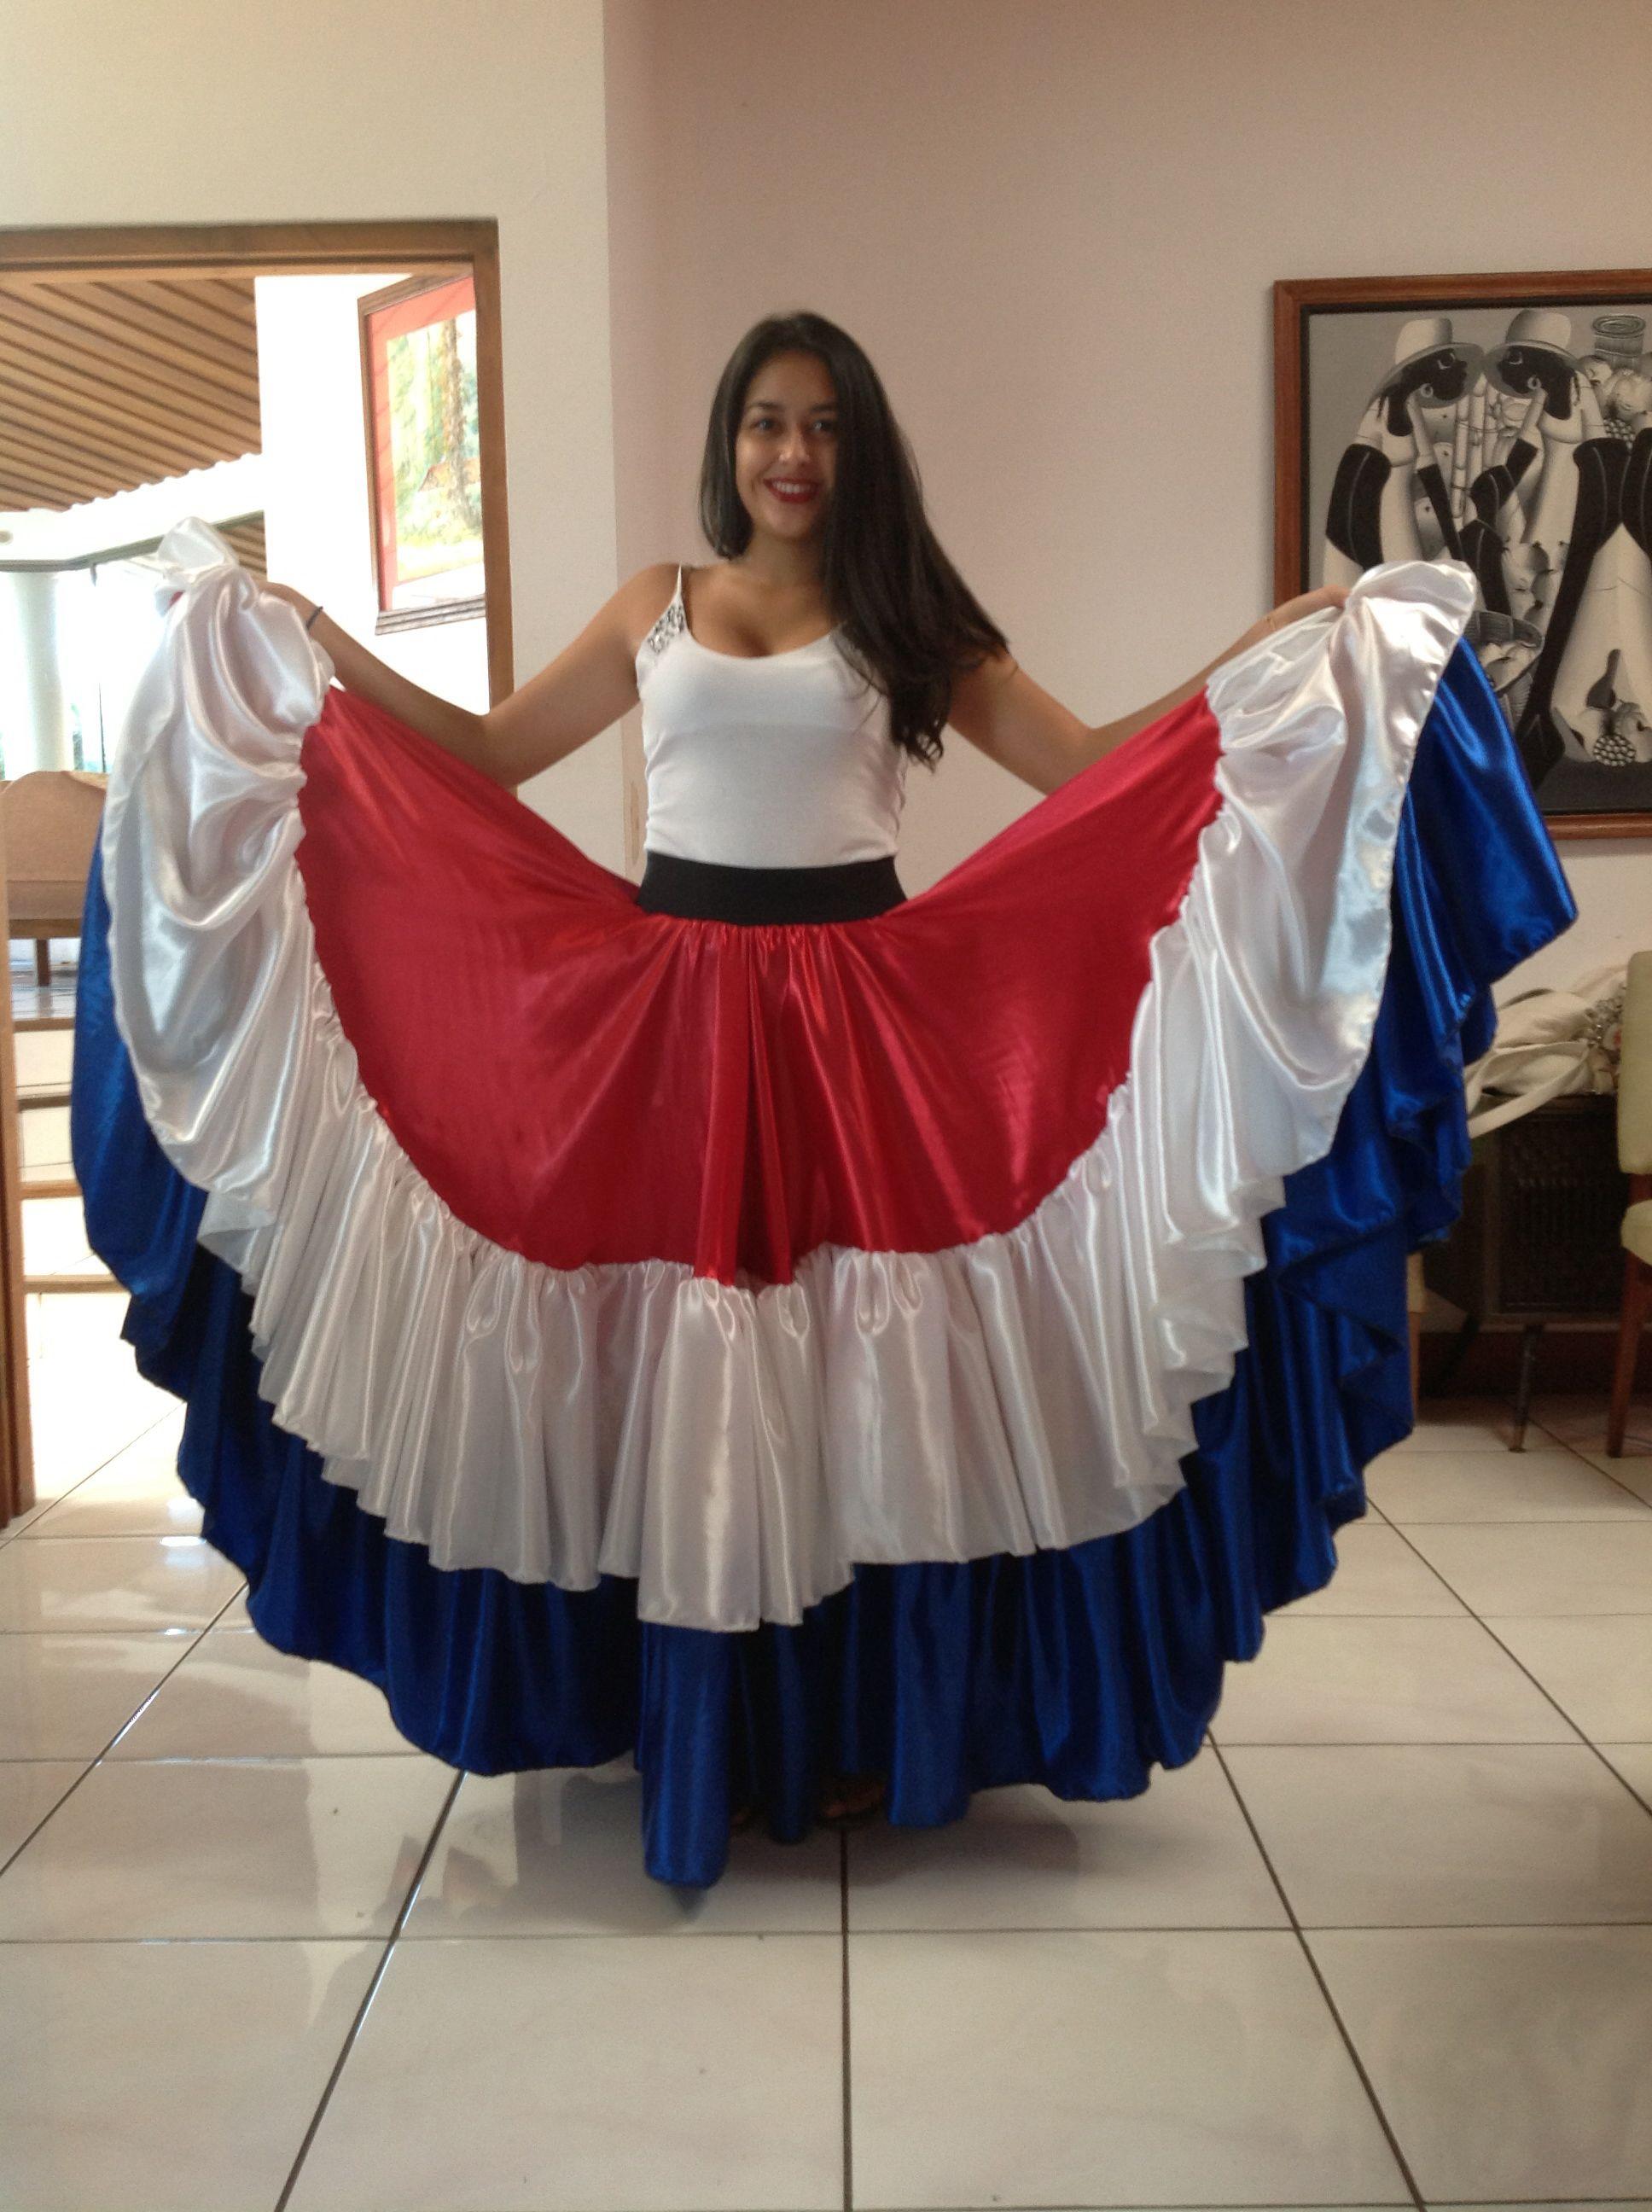 d19e8cc81 Enagua típica costarricense | Costa Rica | Trajes tipicos costa rica ...